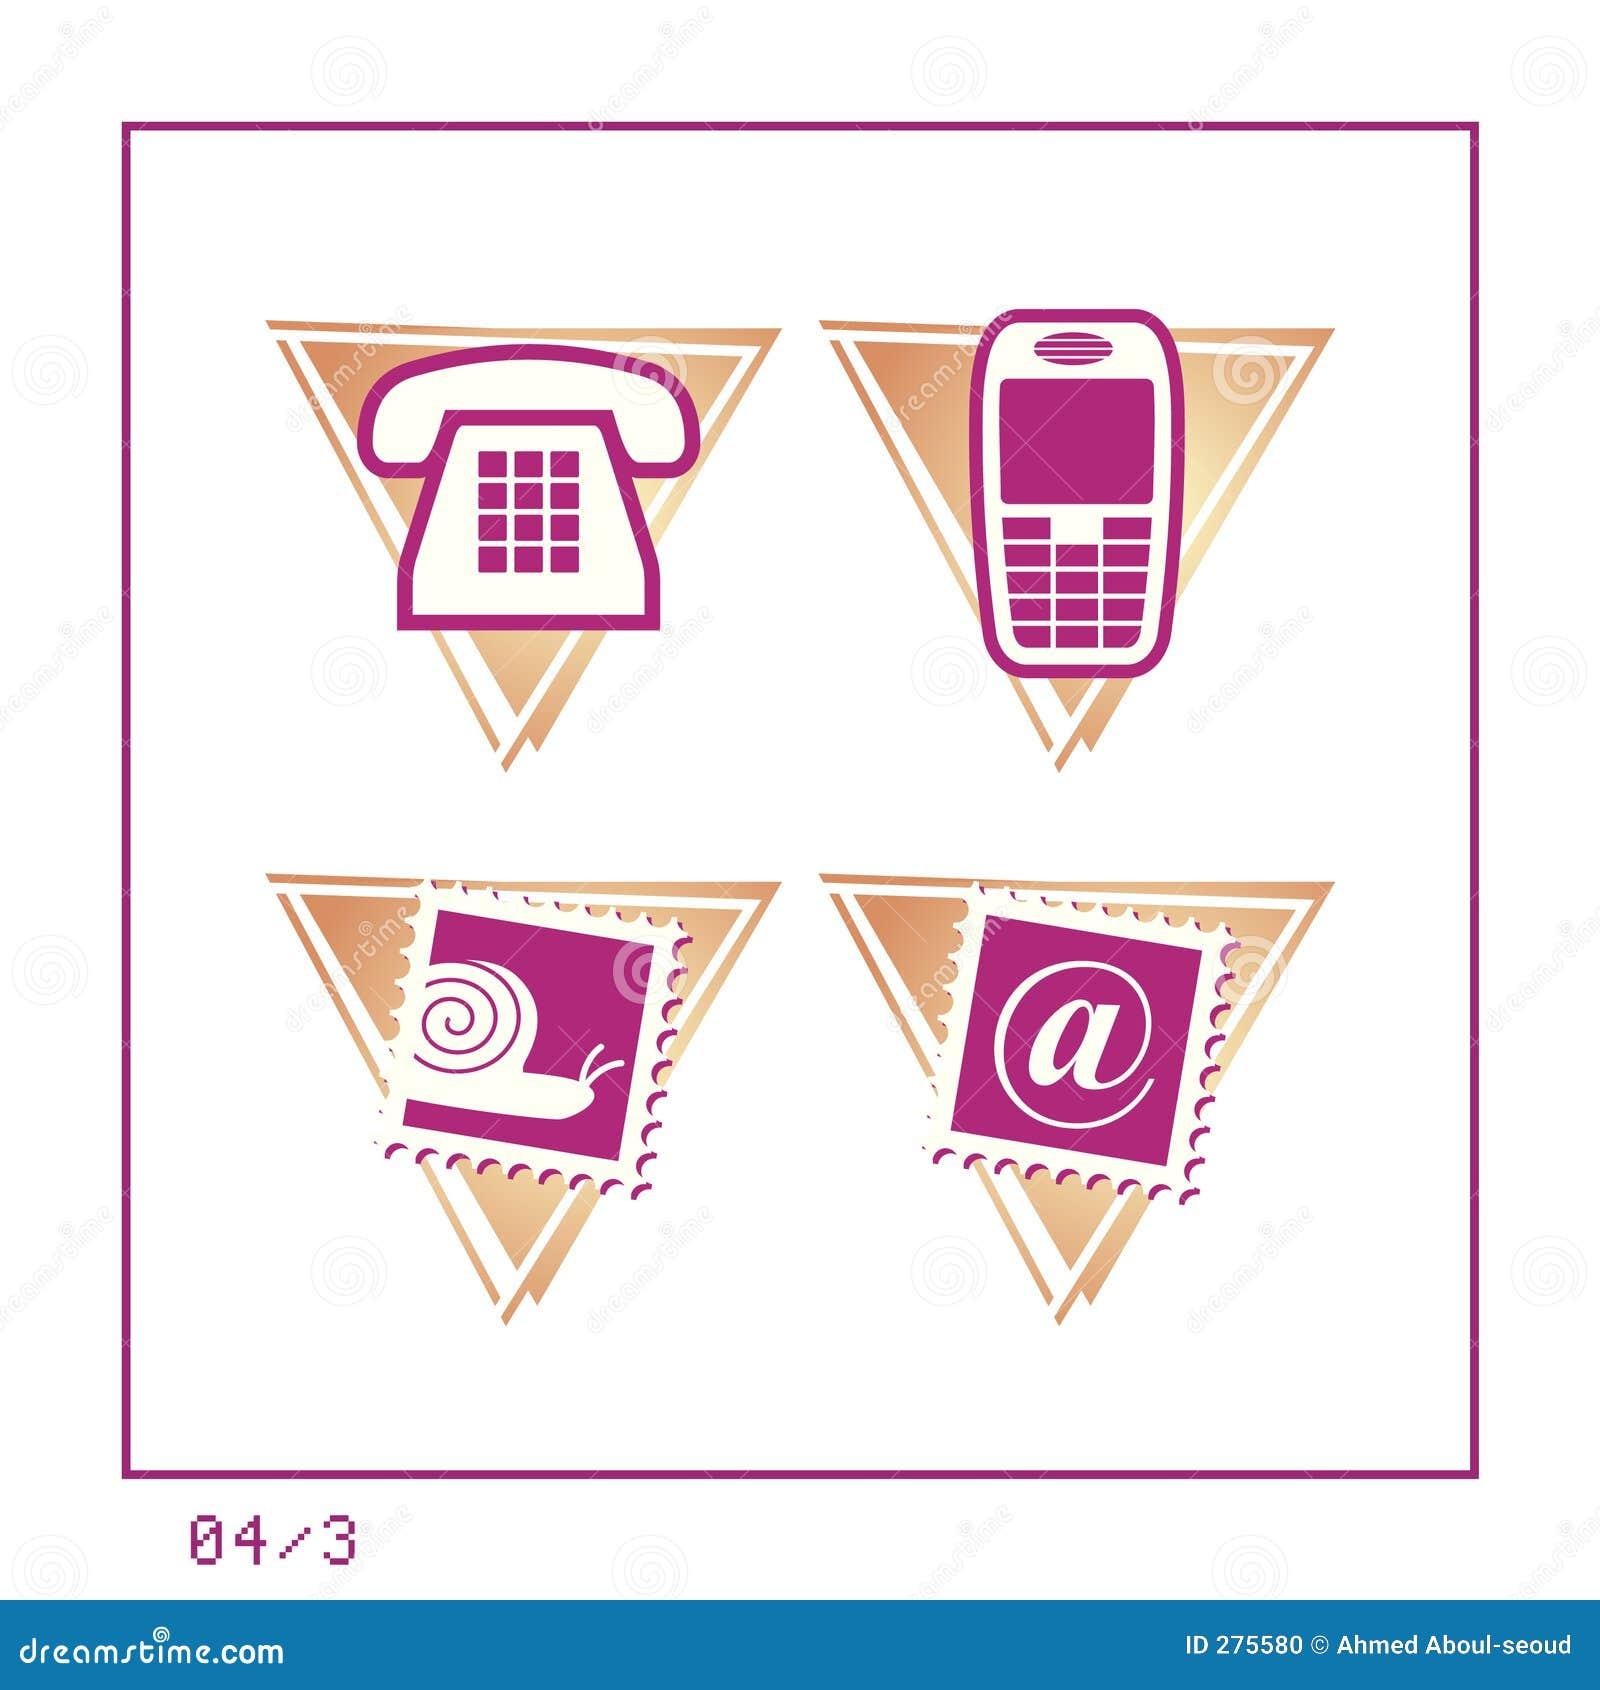 MEDEDELING: Het pictogram plaatste 04 - Versie 3